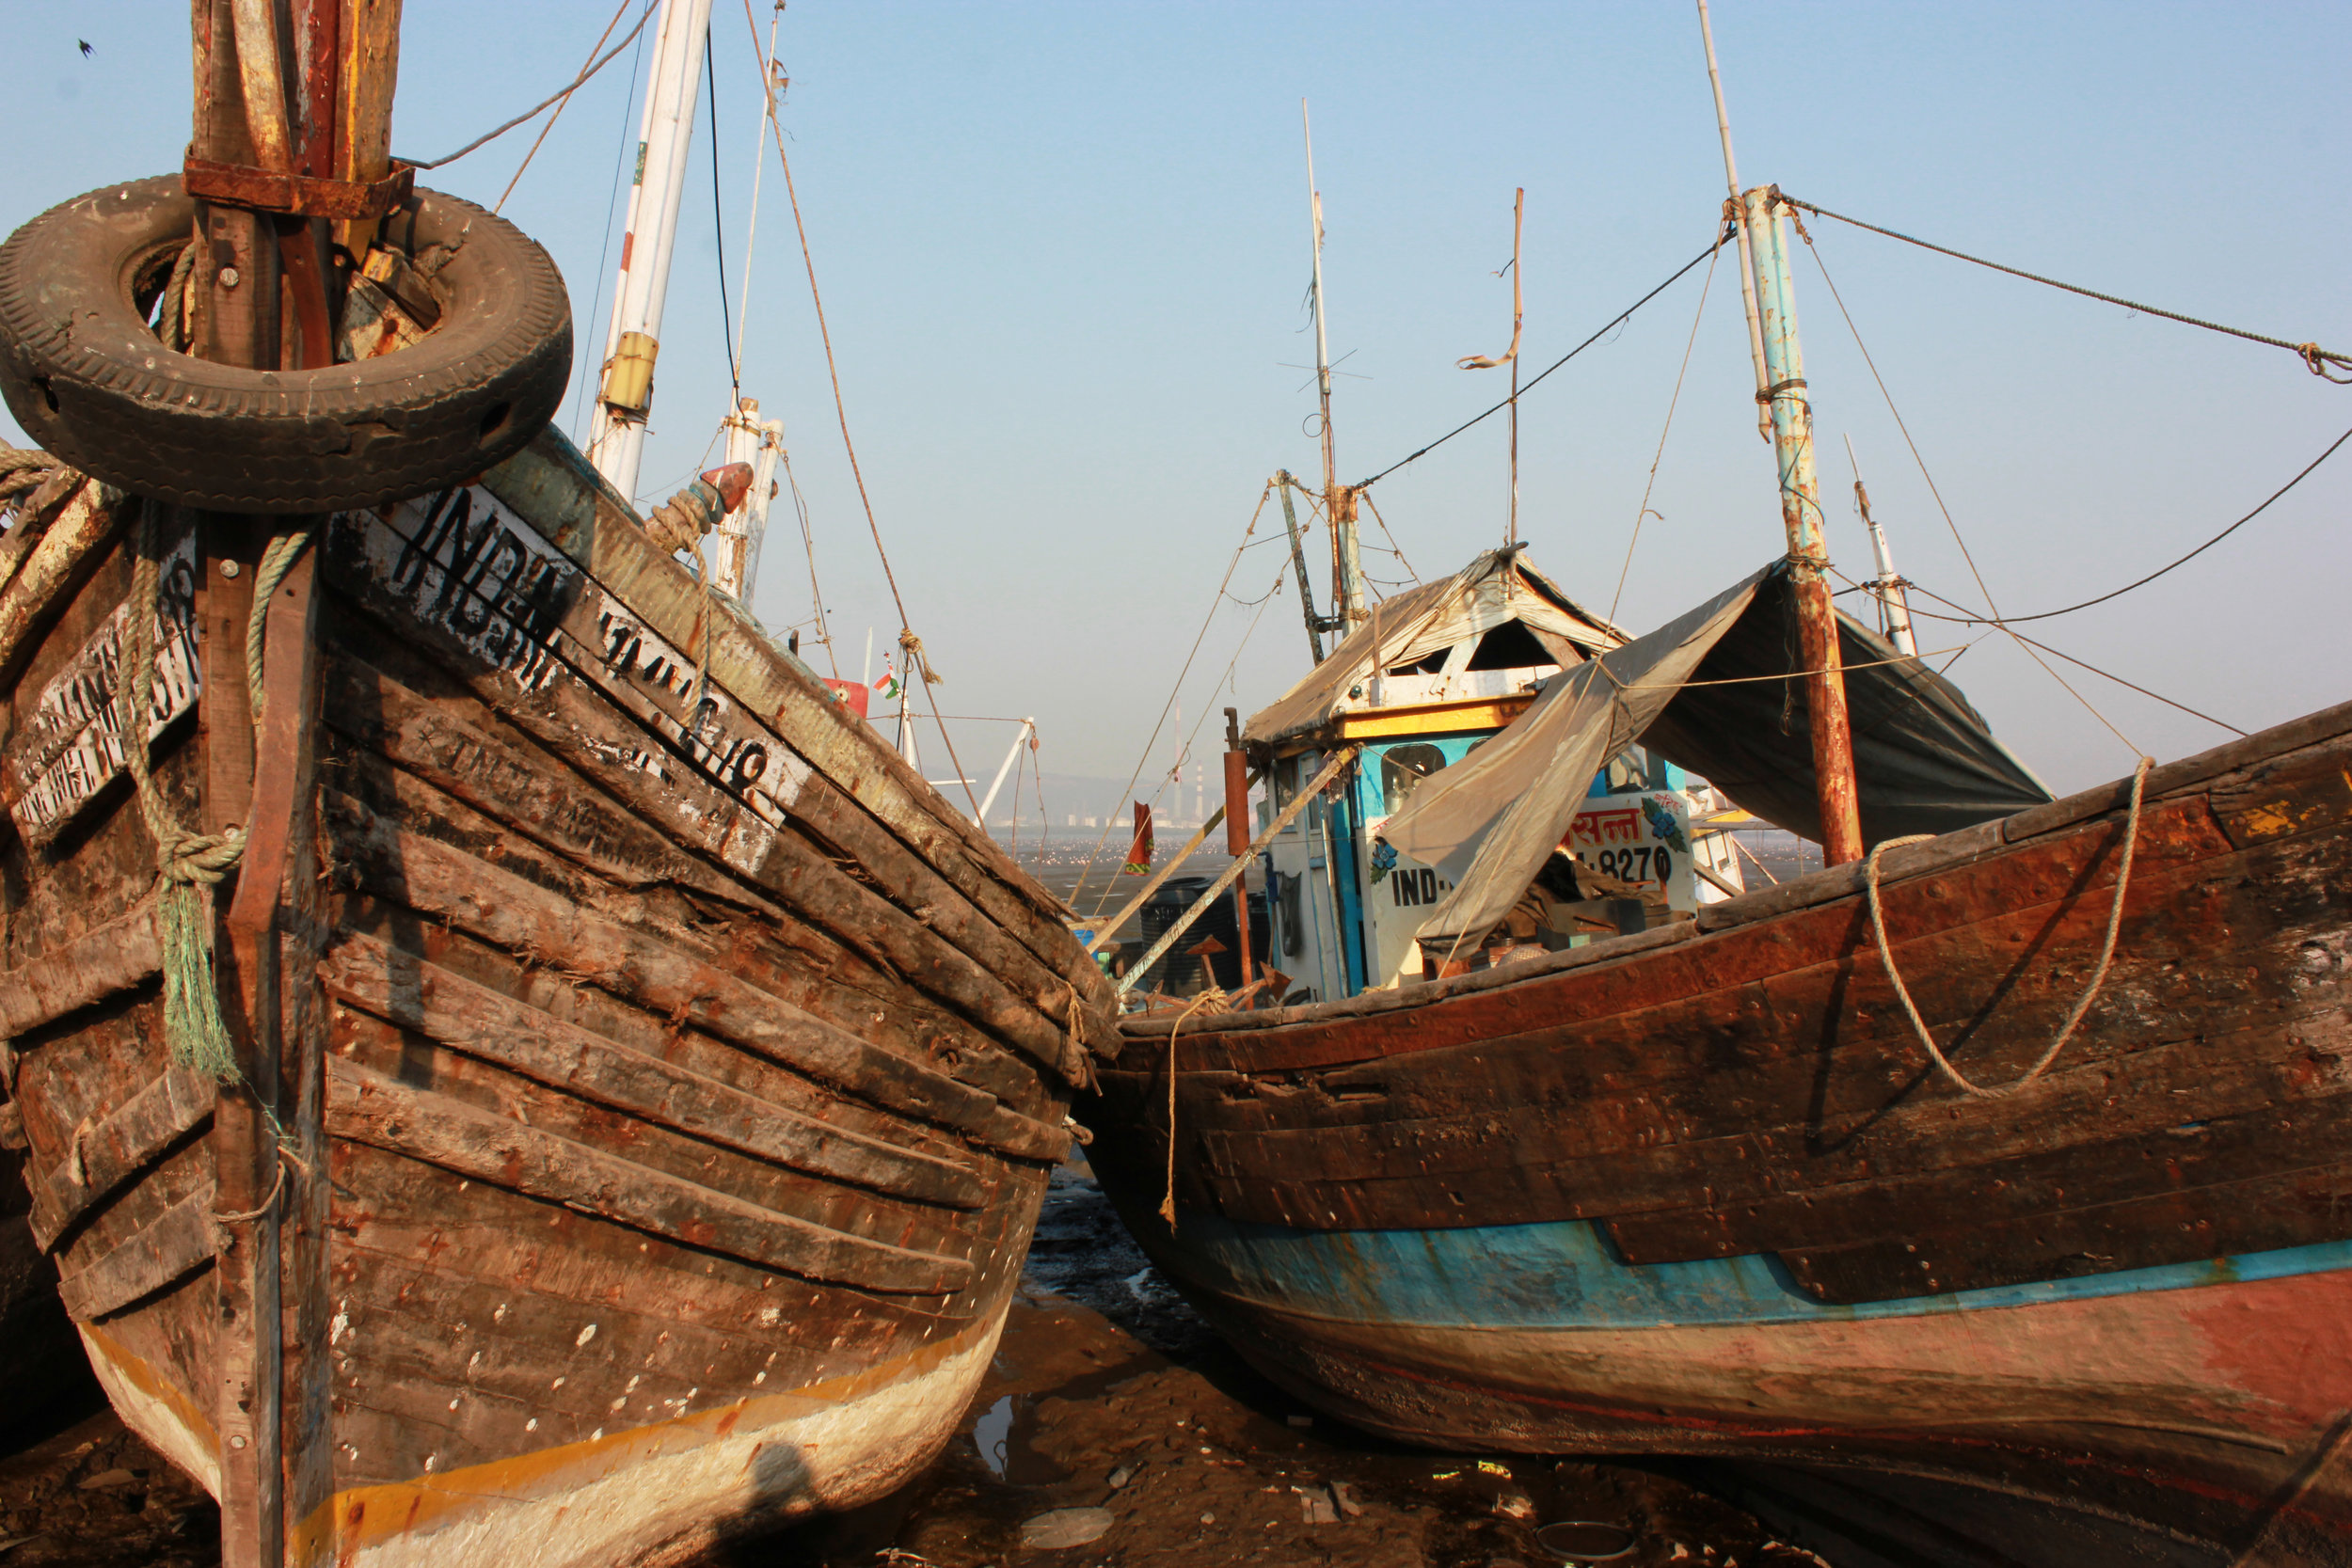 boats4.jpg